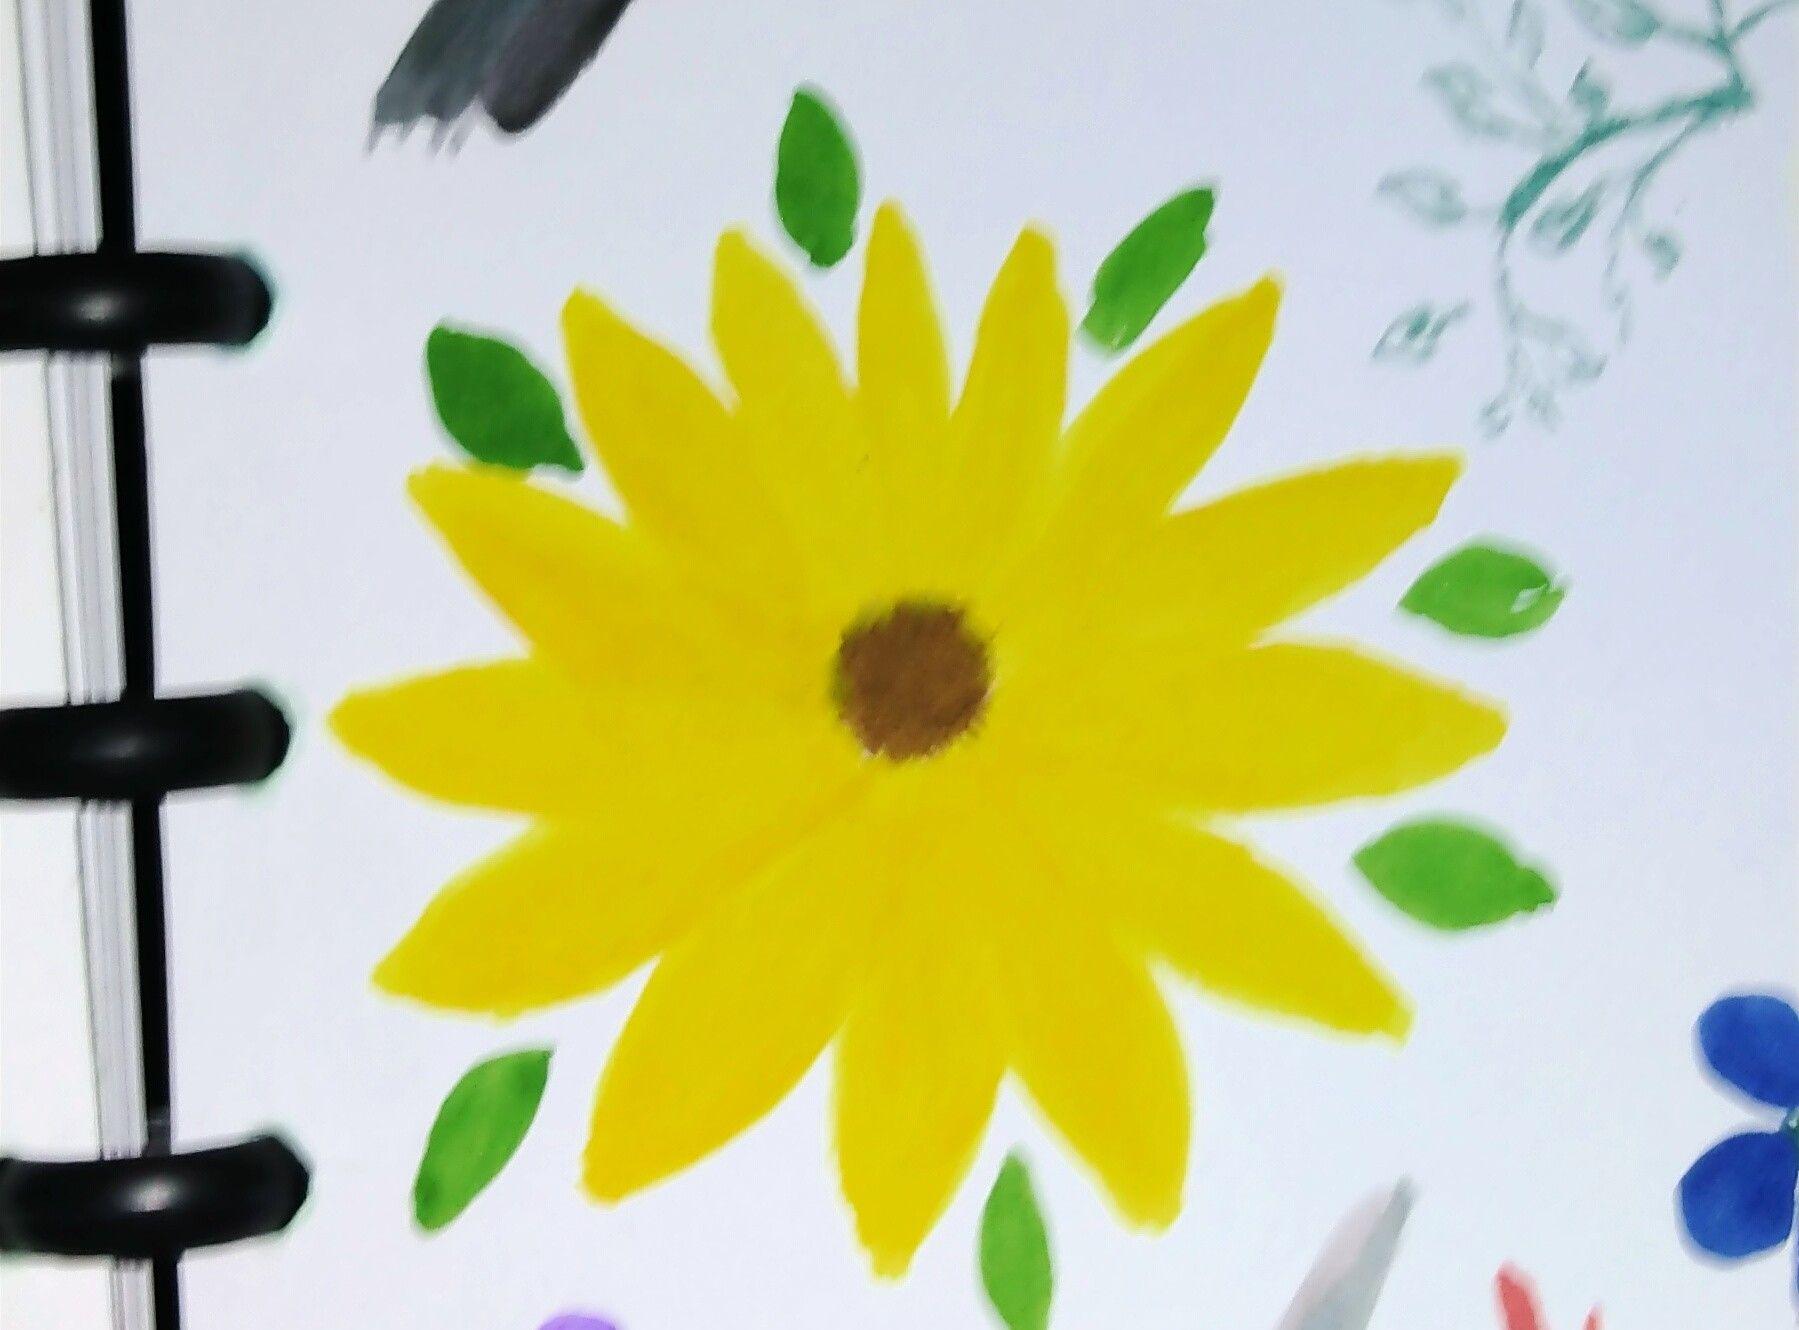 Sunflower Sunflower Sunflower